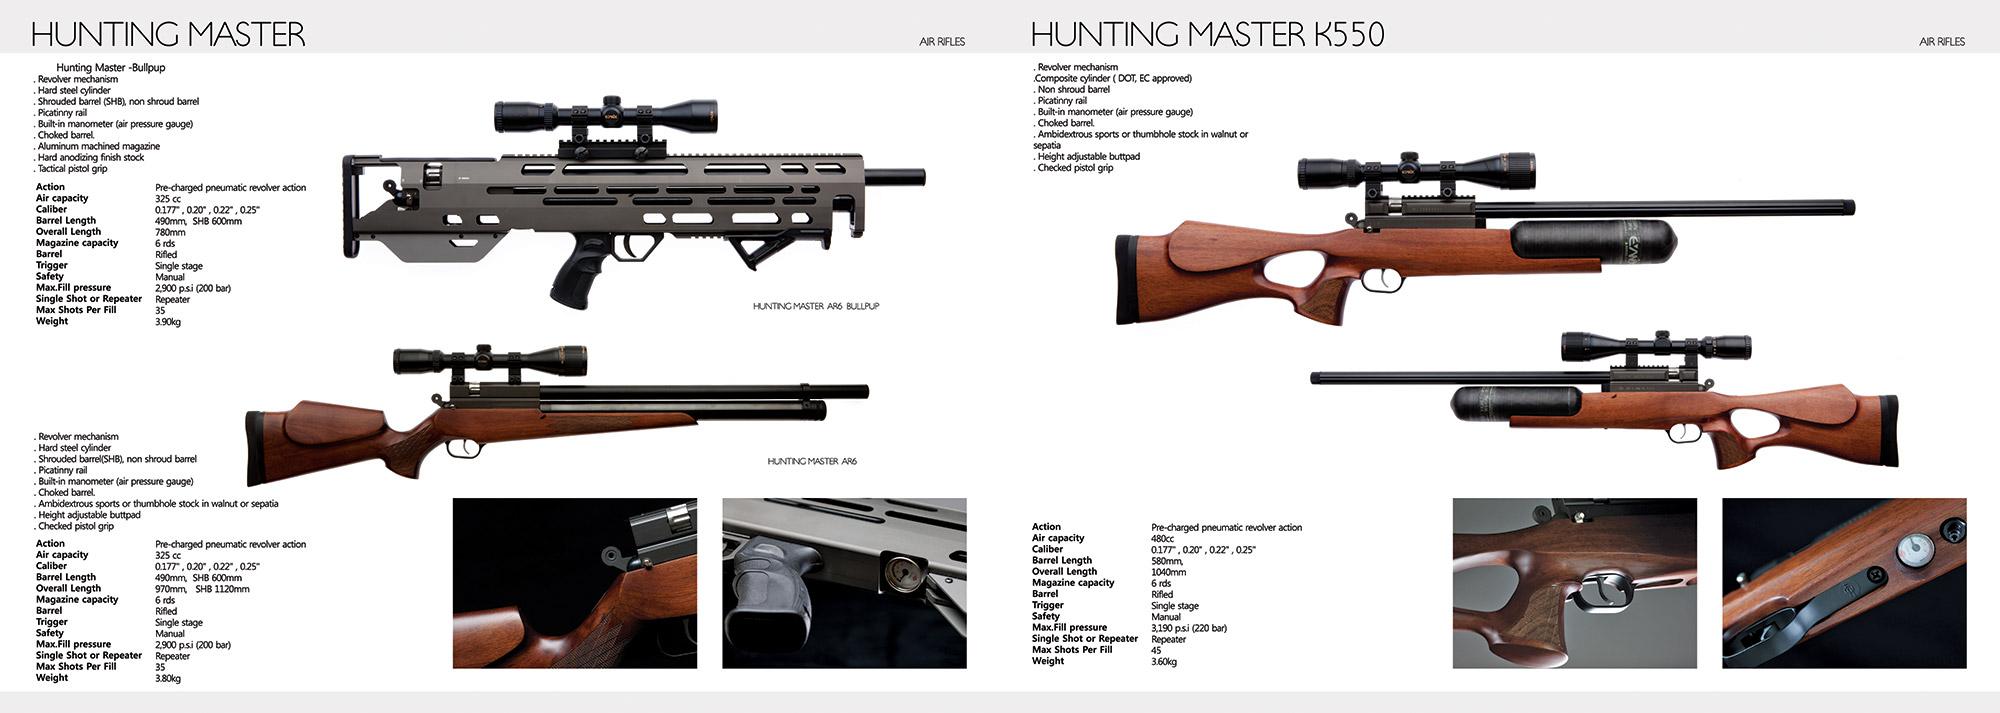 http://www.mdqbalines.com.ar/img-artic/Evanix_Hunting_Master.jpg